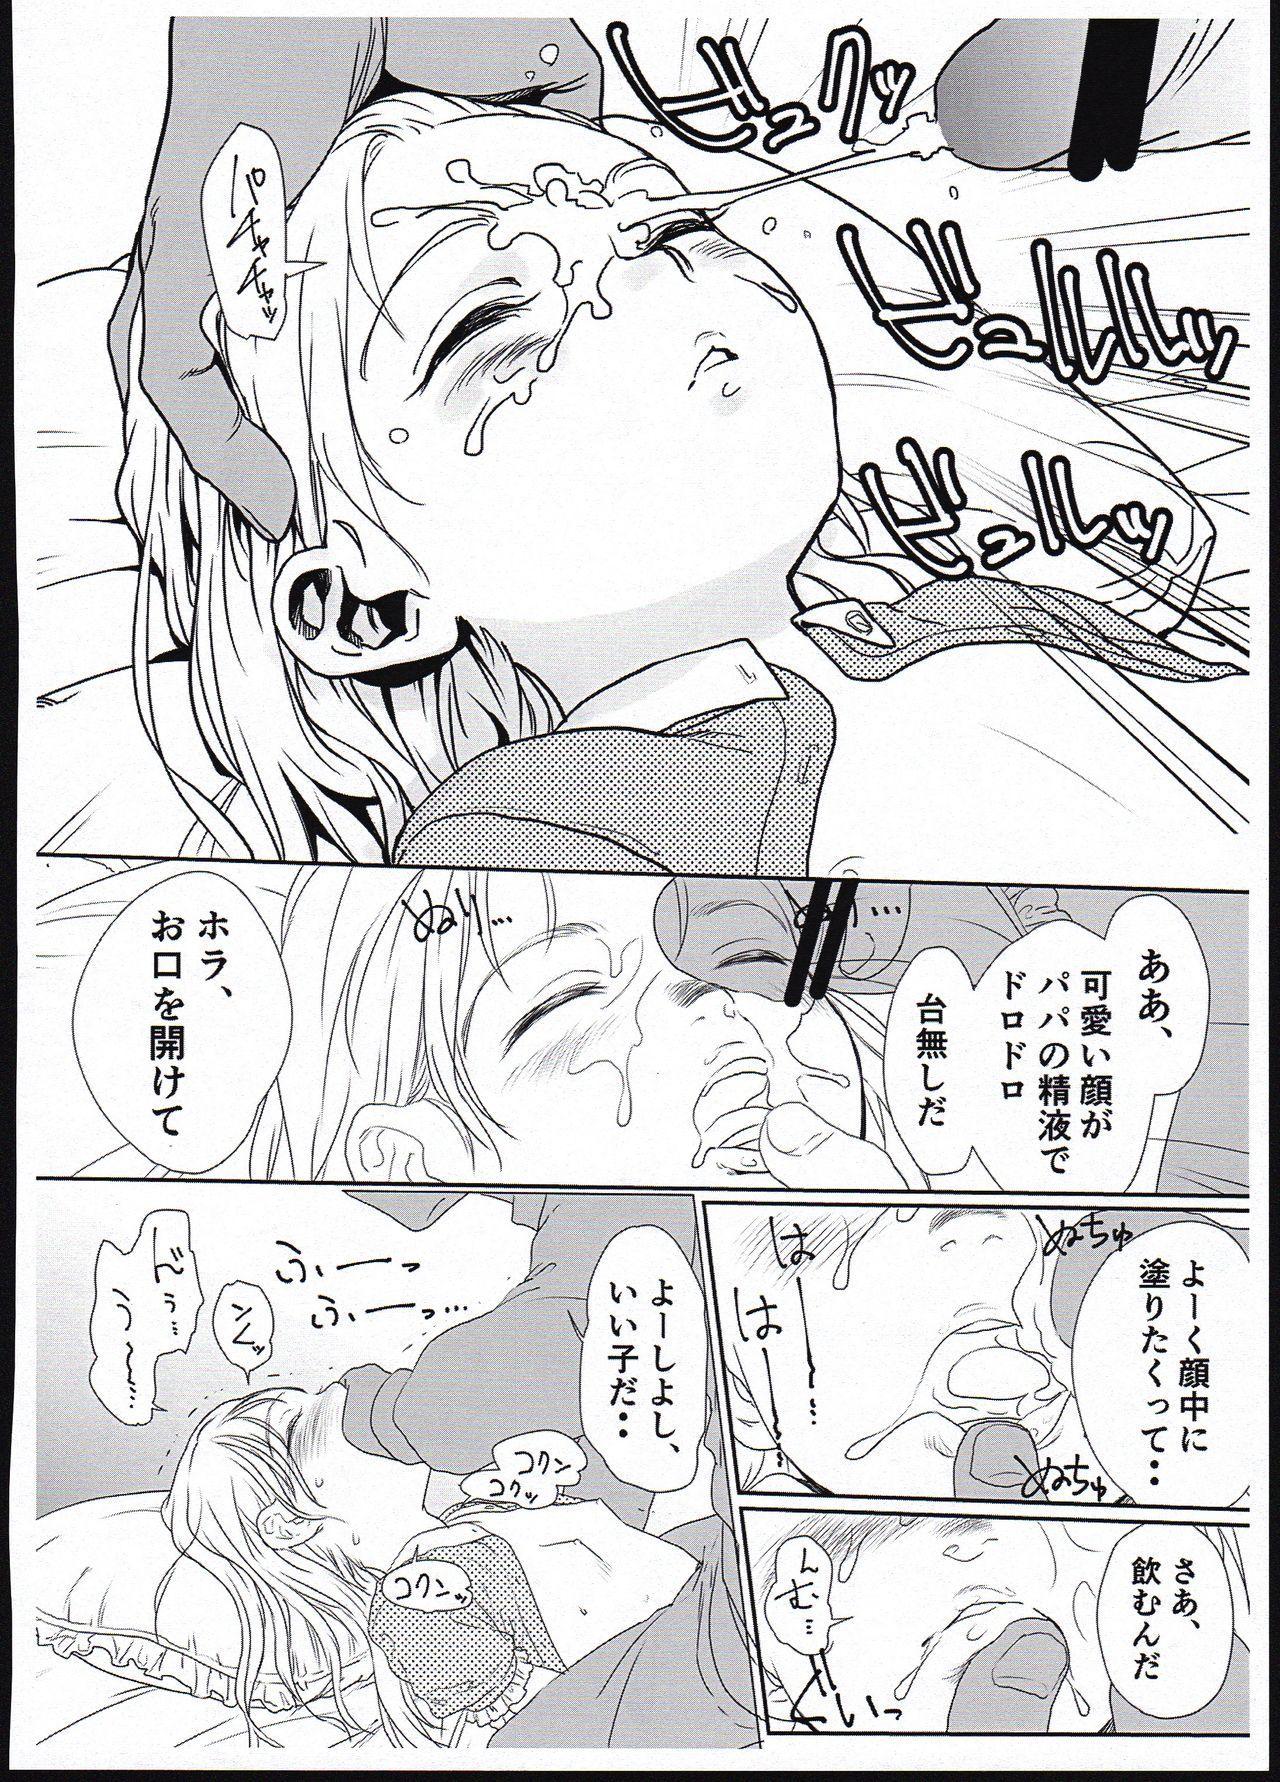 Kaijou Gentei Copybon 3